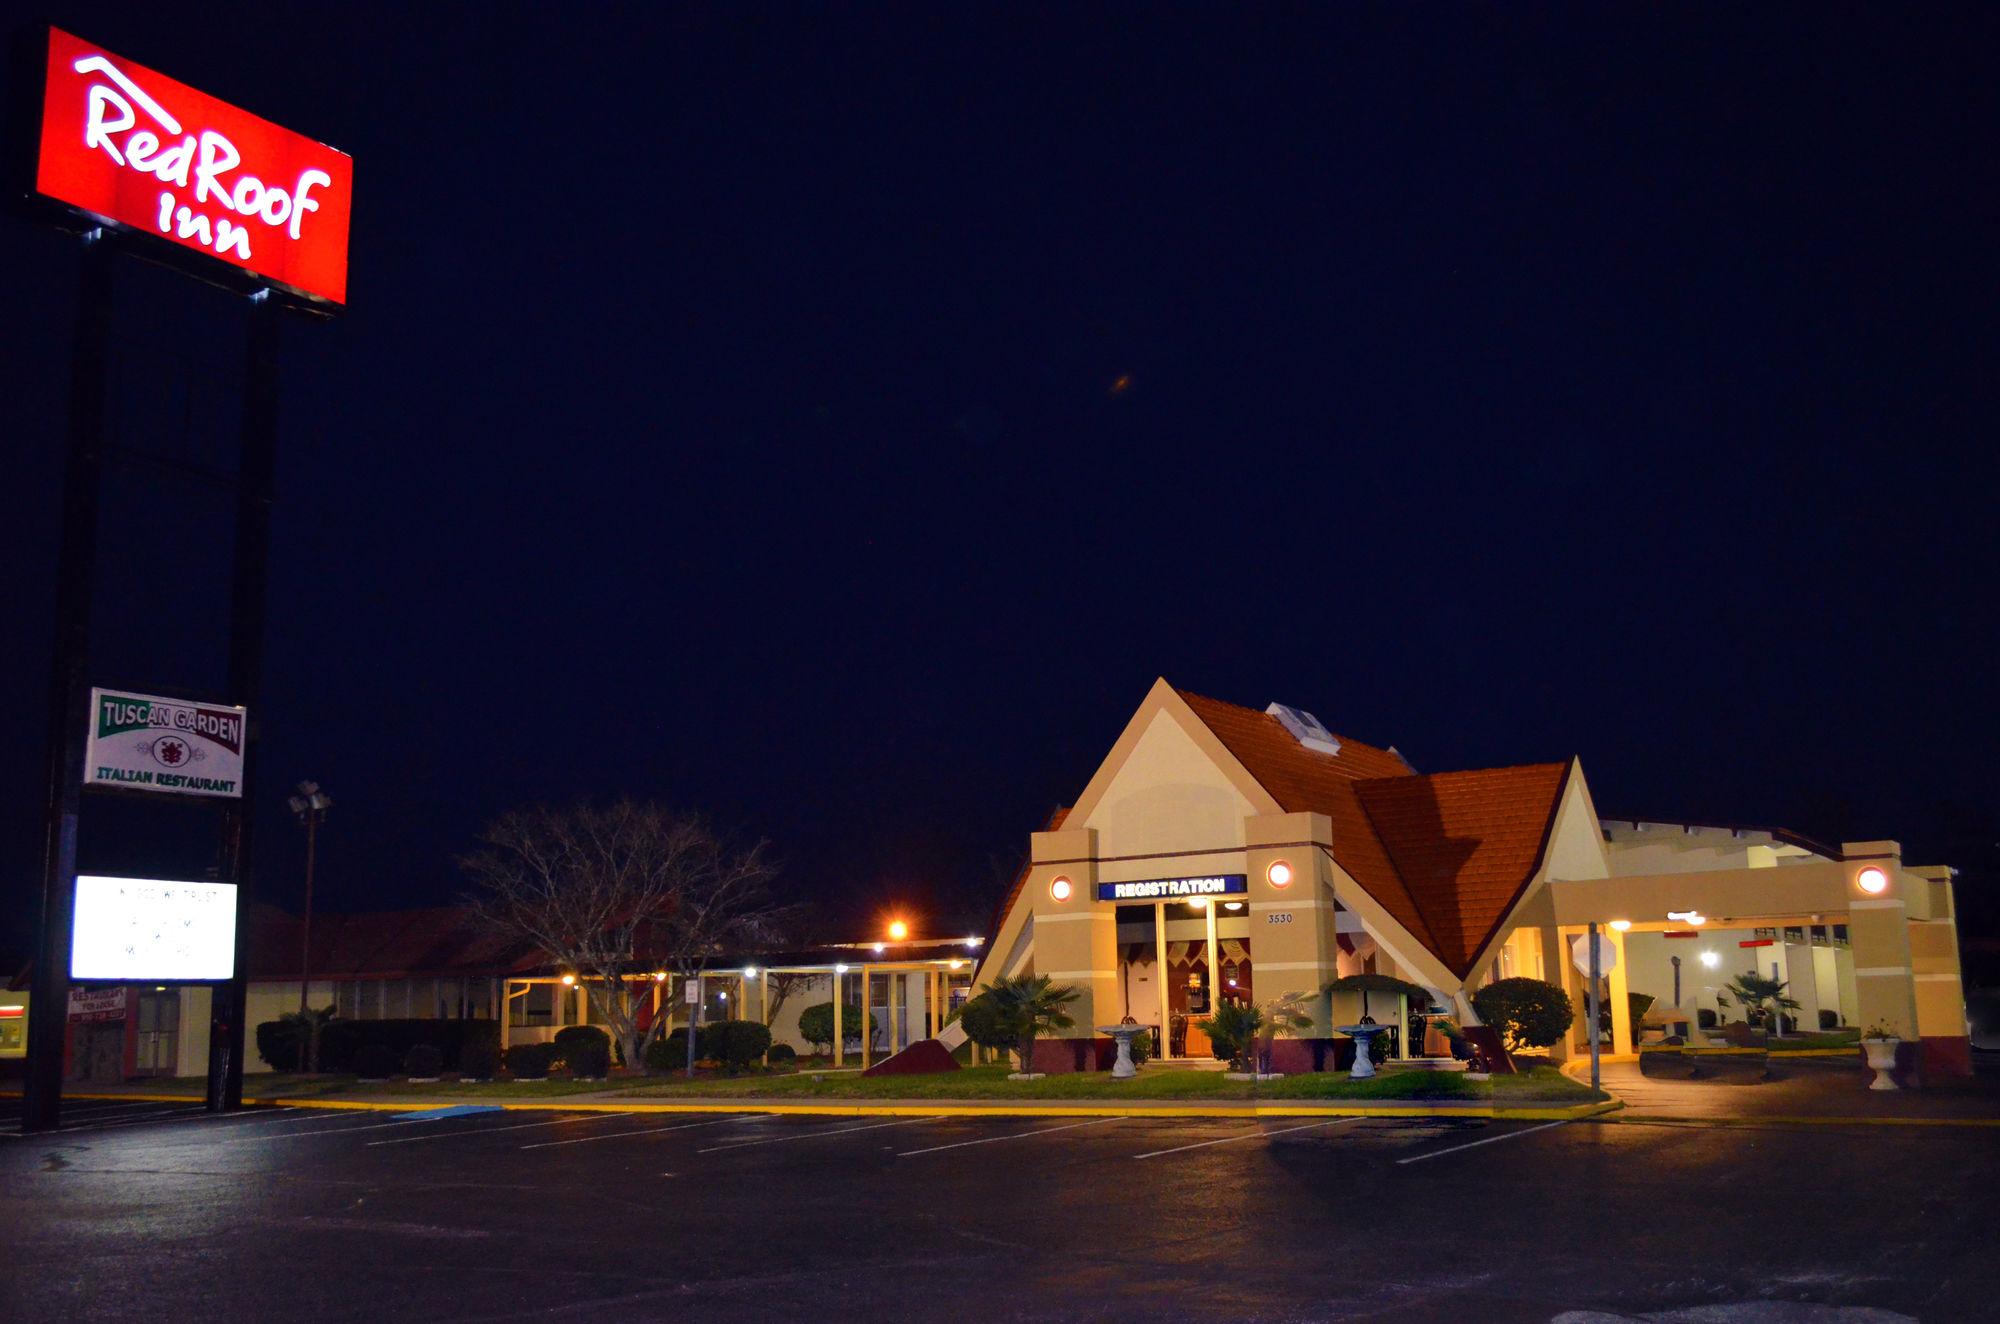 Red Roof Inn Lumberton in Lumberton, NC